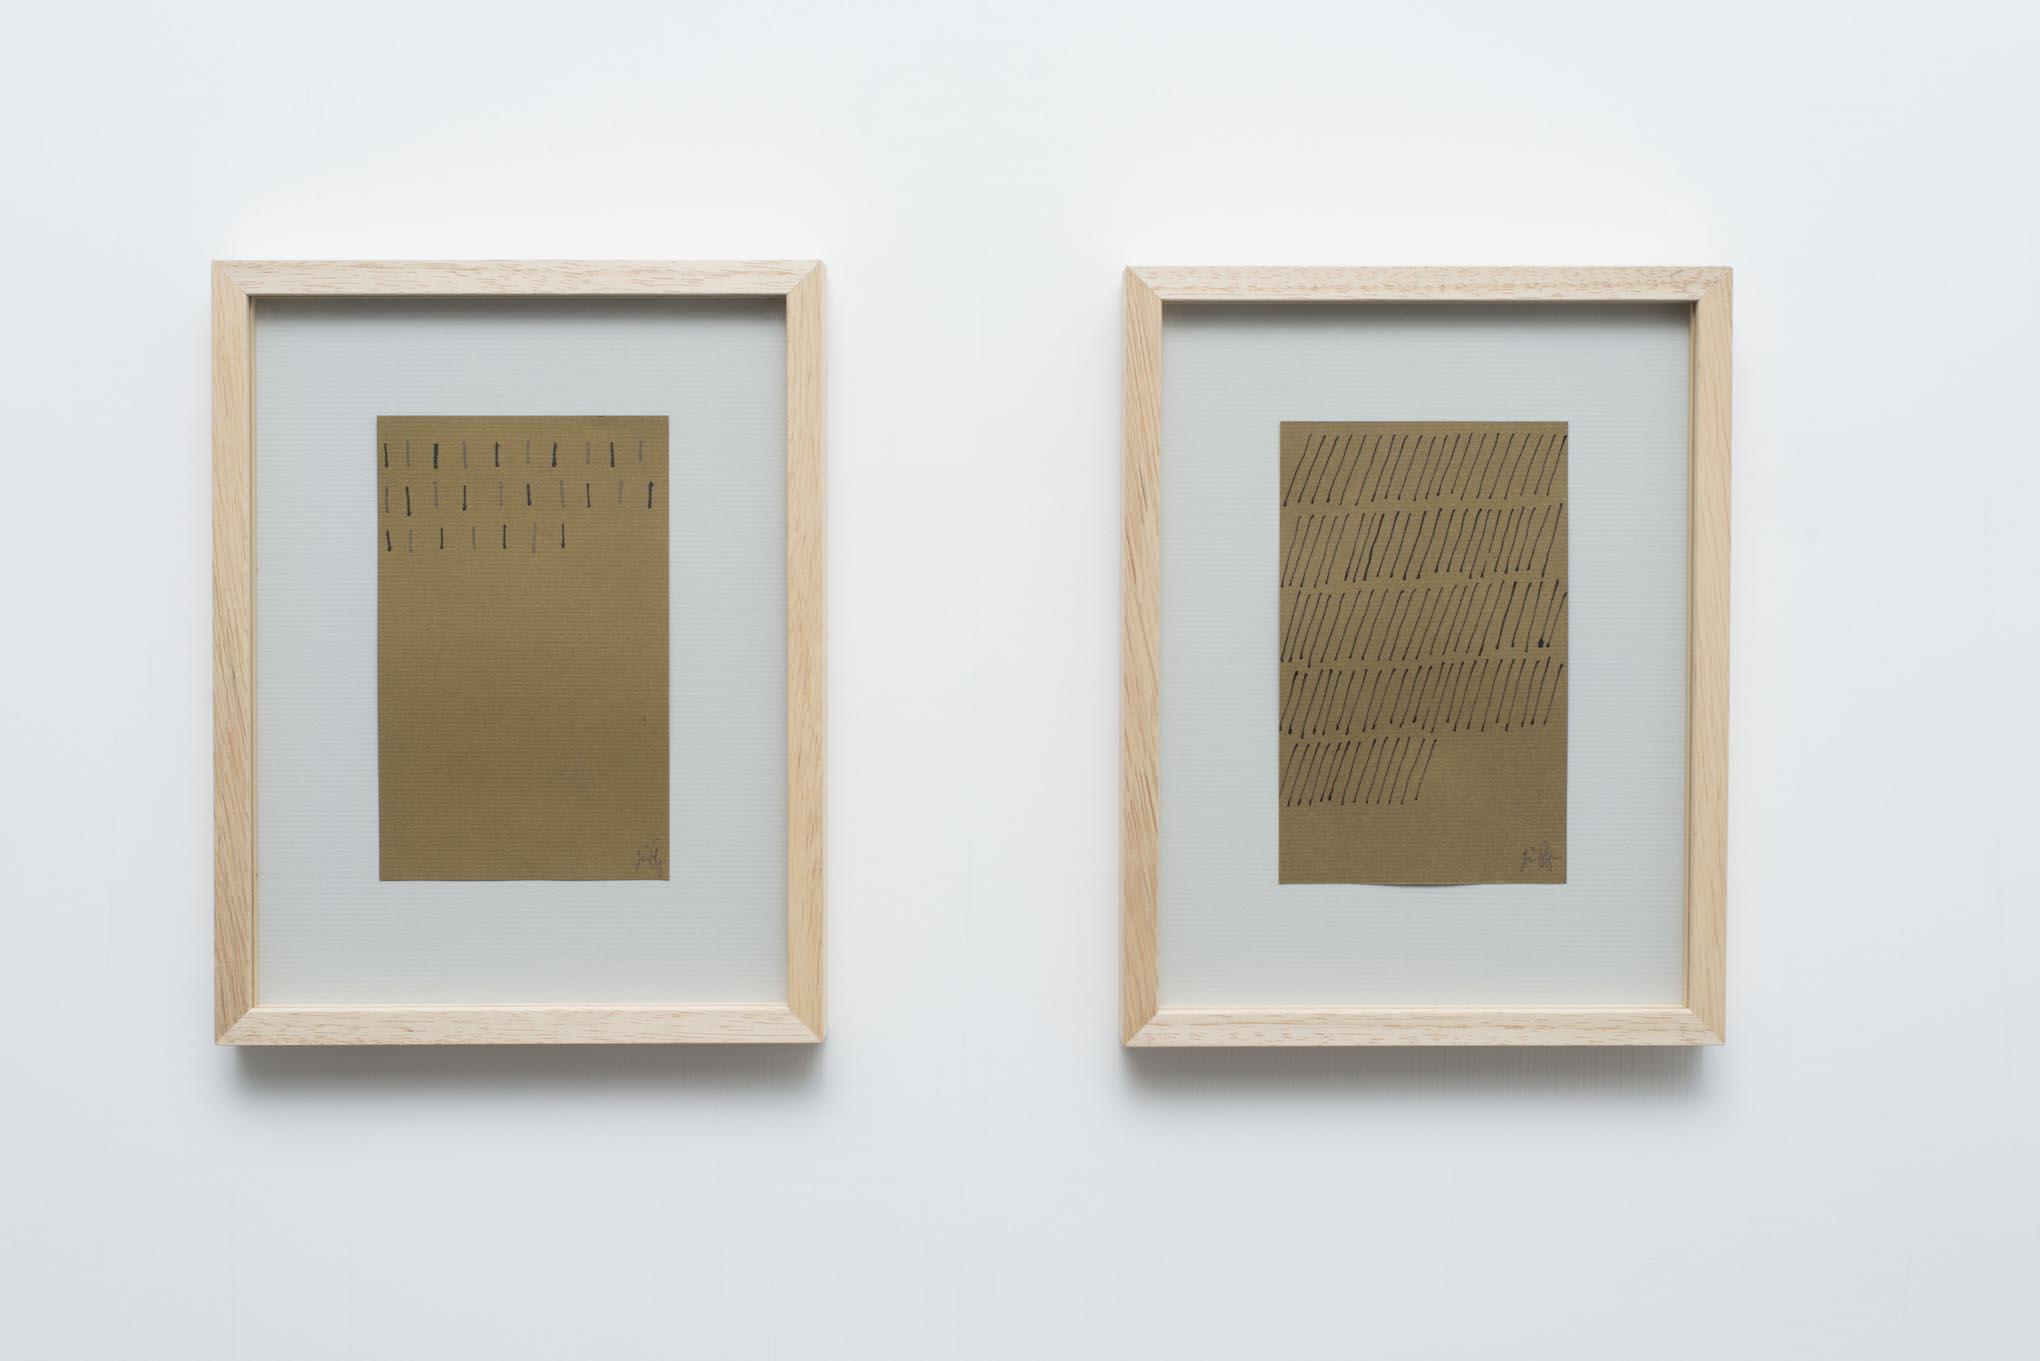 Giorgio Griffa: Works on Paper Installation view, Rome, 2014, photo Giorgio Benni